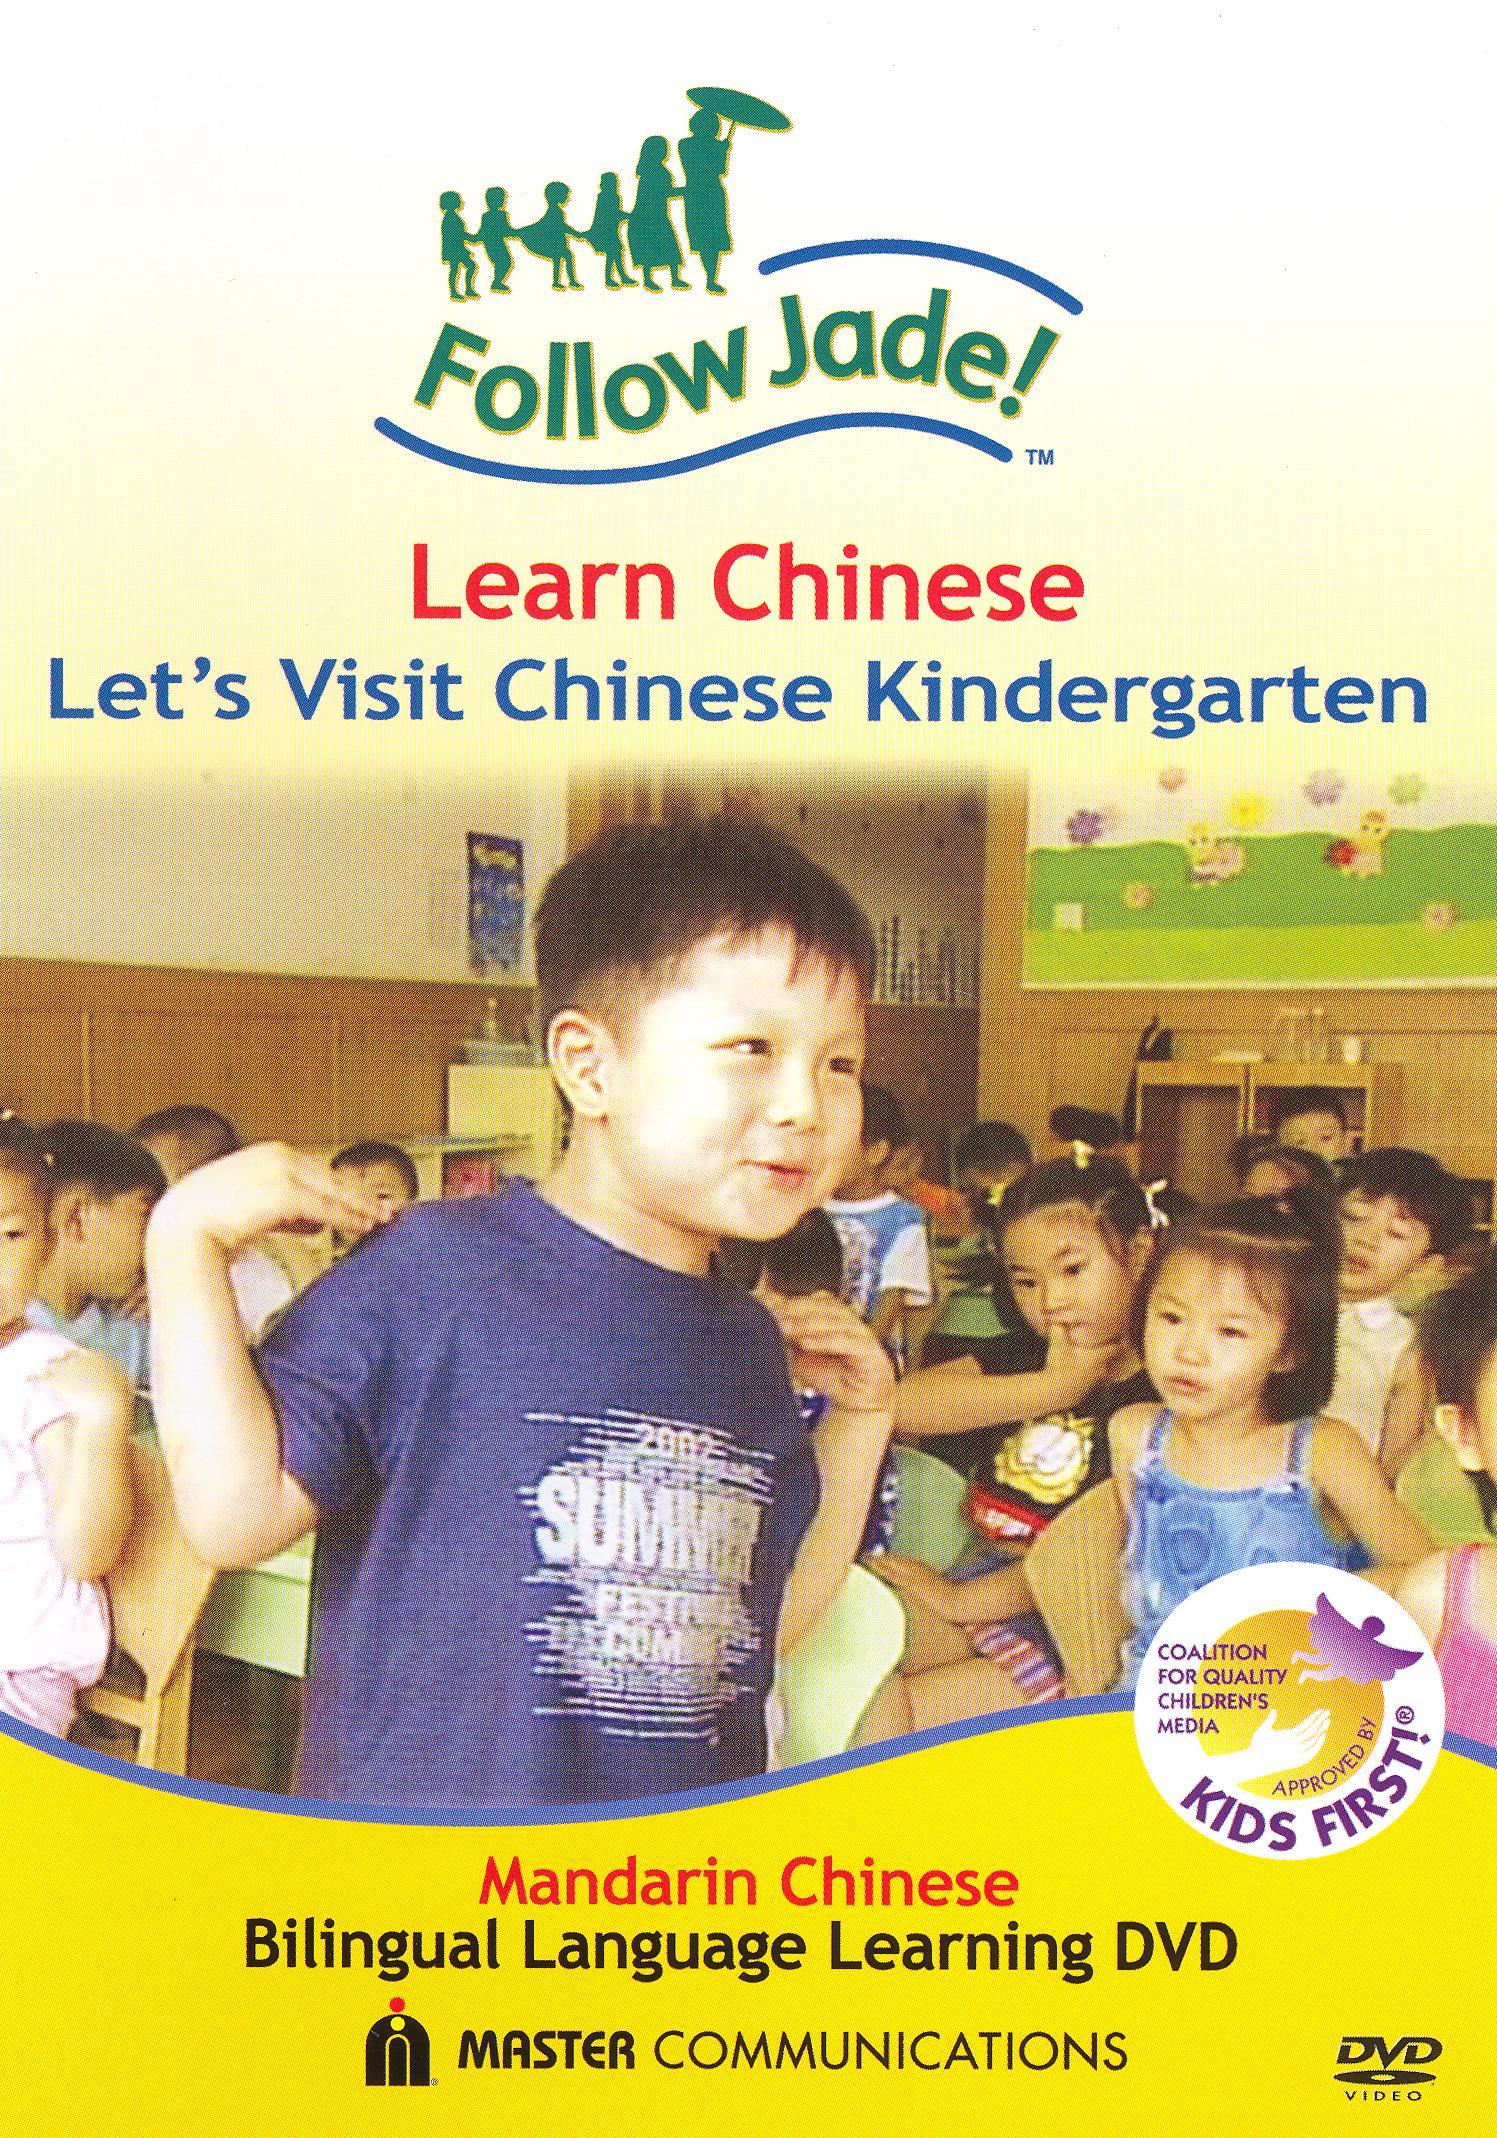 Follow Jade! Let's Visit Chinese Kindergarten